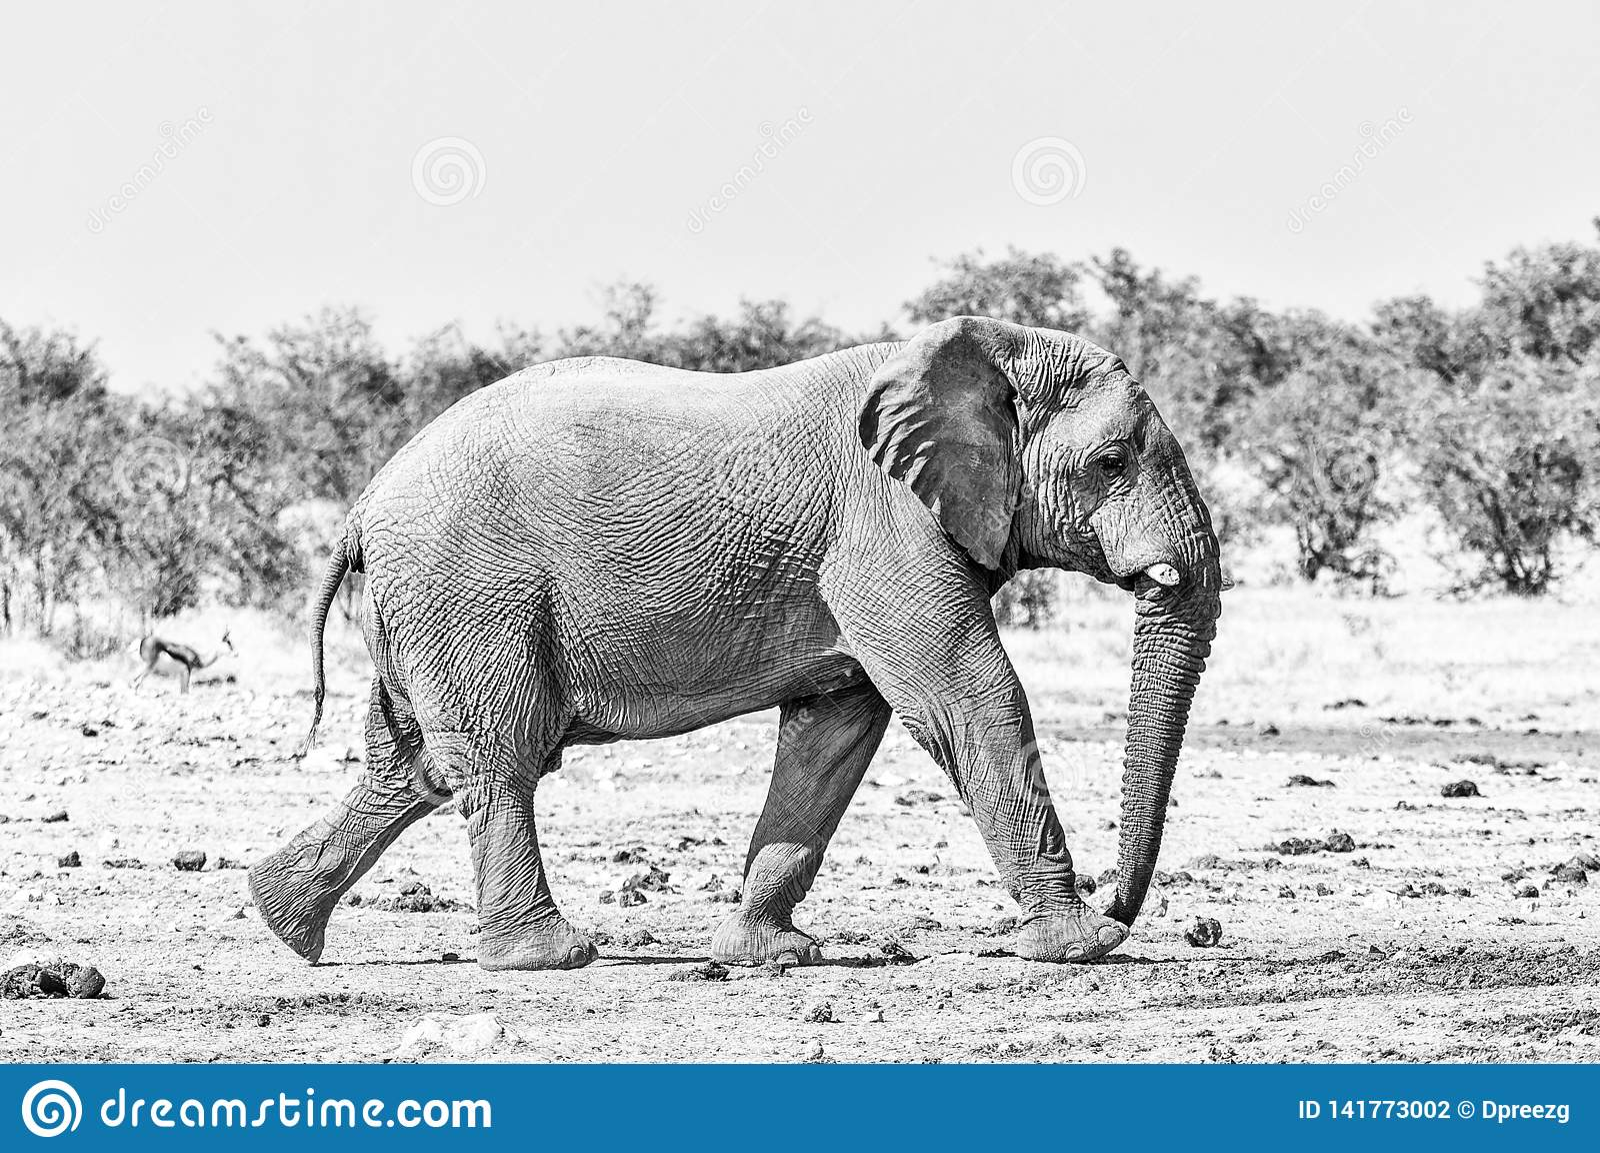 African elephant walking. Monochrome